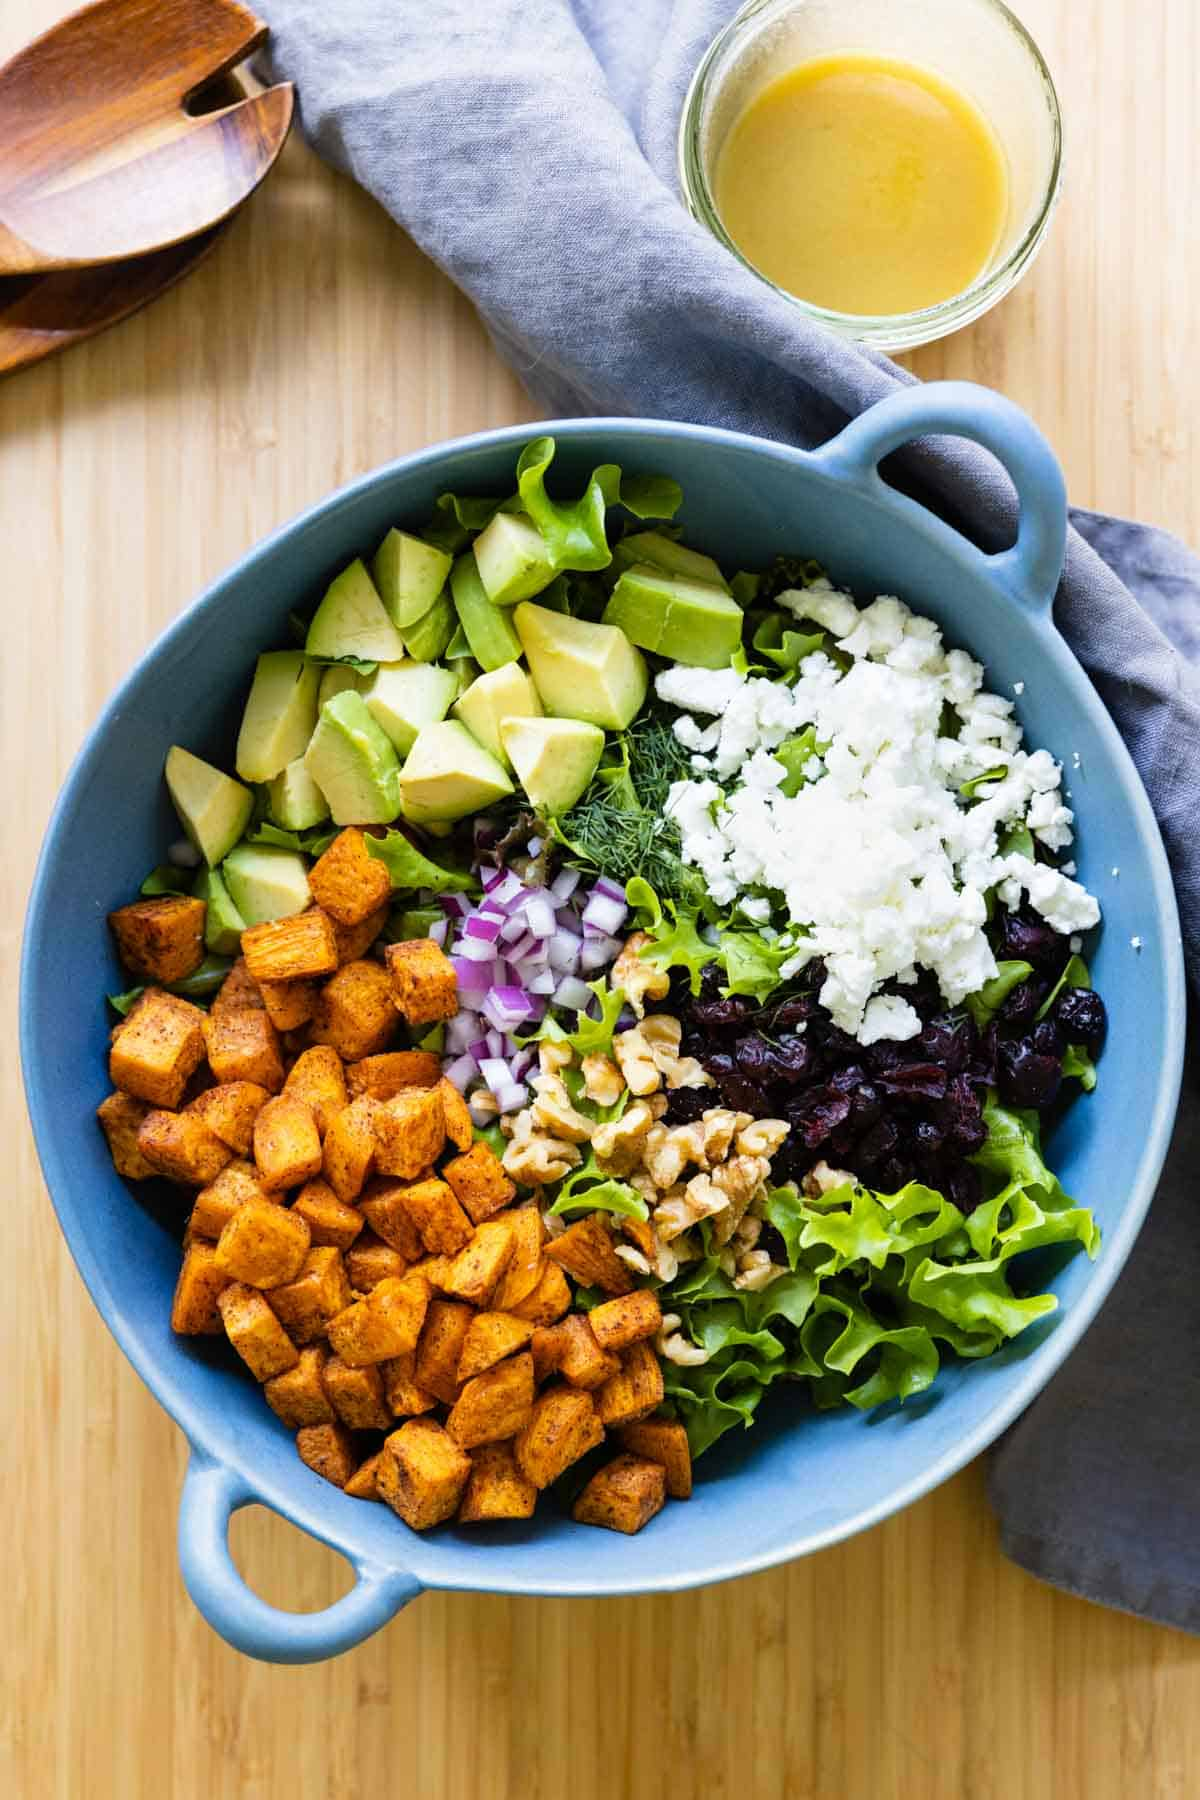 Lettuce, roasted sweet potato, avocado, onion, feta, cranberries in a blue salad bowl, dressing on the side.